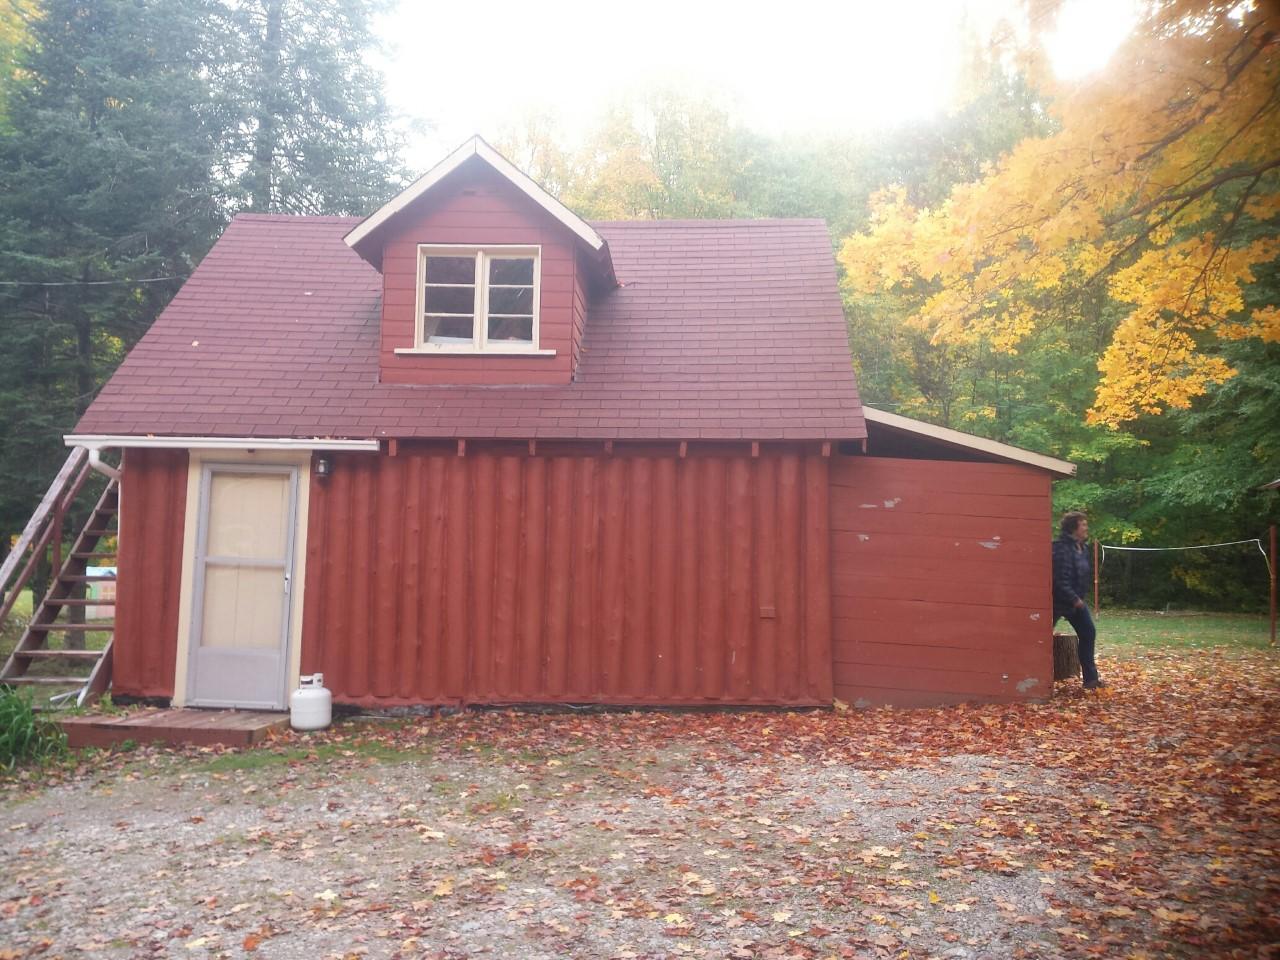 Sauna House with Ute.jpg